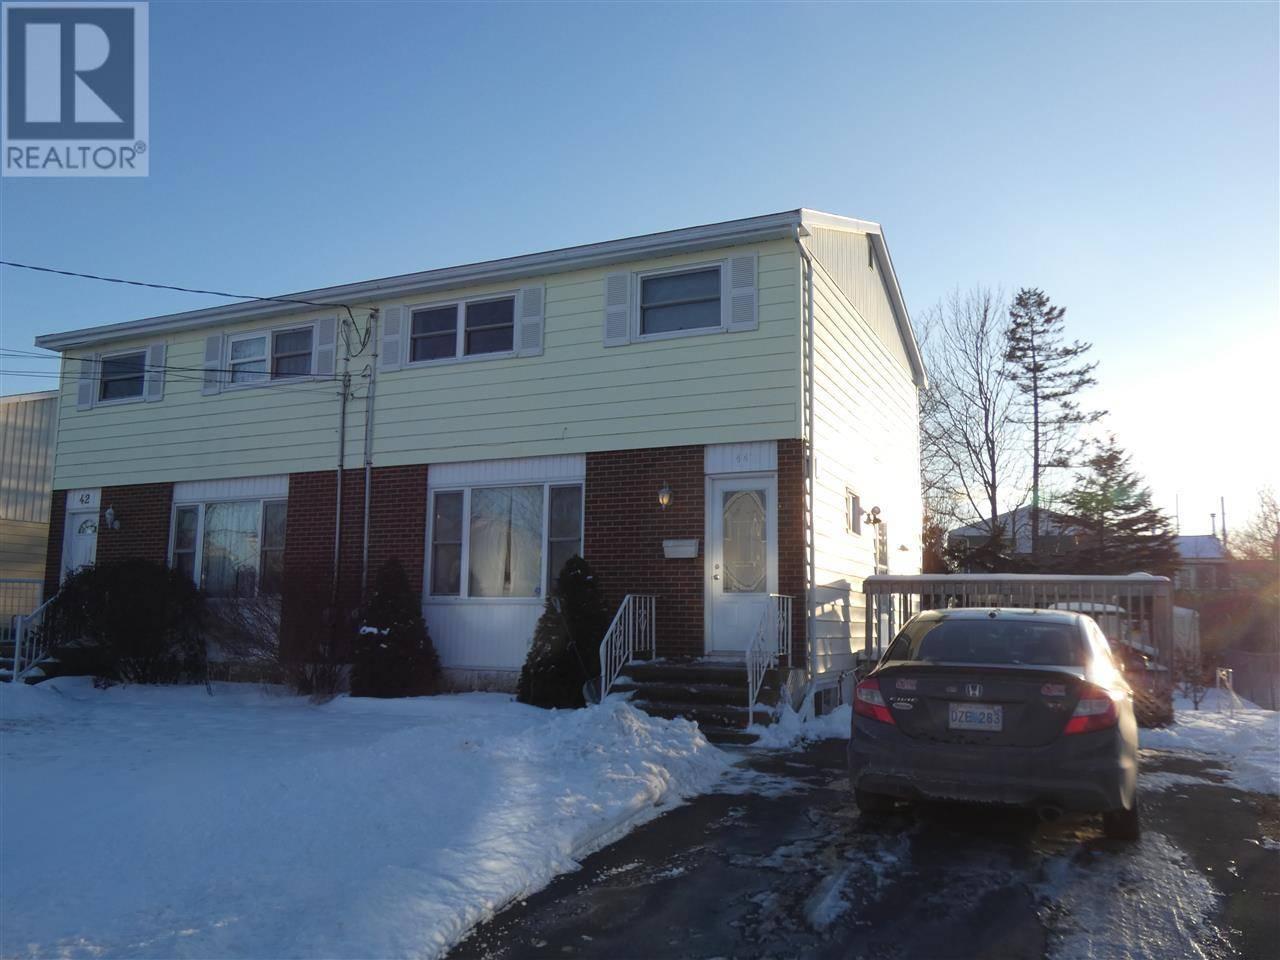 House for sale at 44 Shrewsbury Rd Halifax Nova Scotia - MLS: 202001134